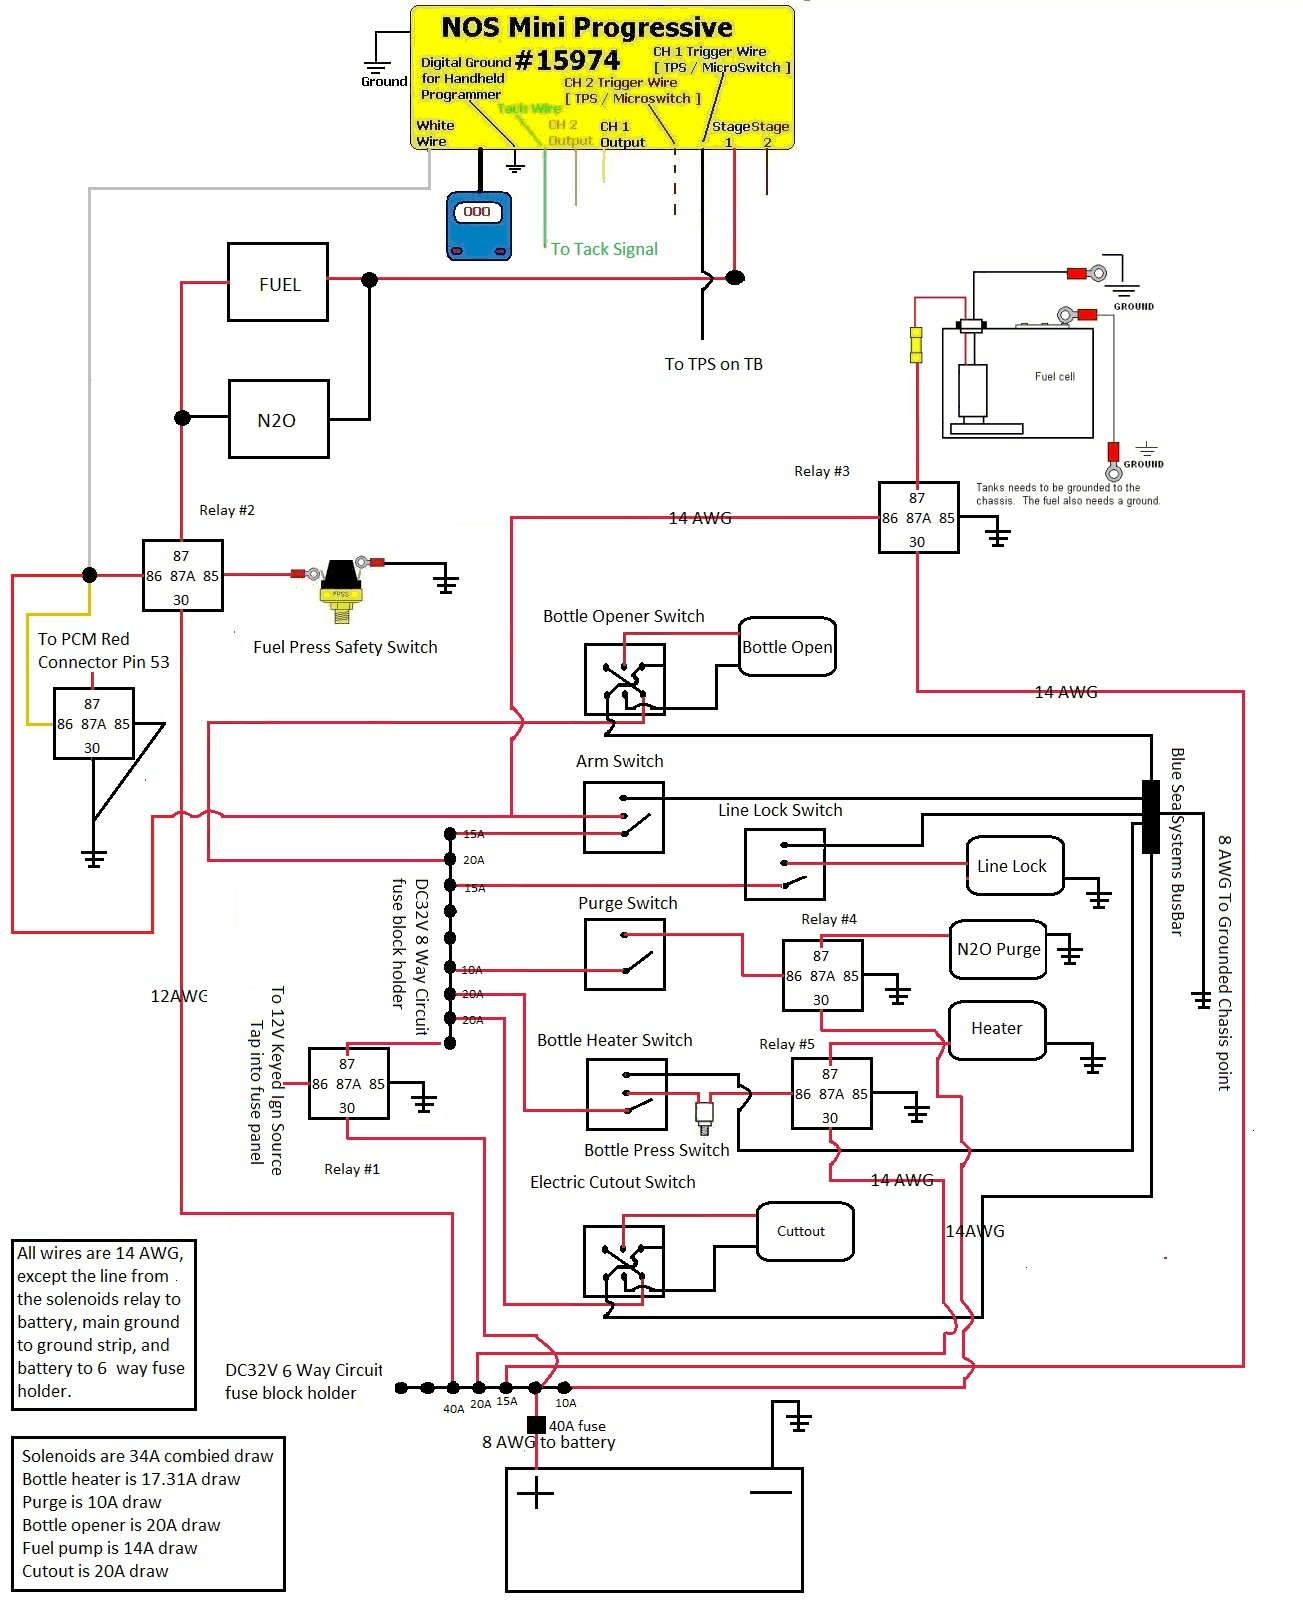 advance mark 7 wiring diagram wiring diagram SINCGARS Radio Configurations Diagrams advance mark 7 wiring diagram ls1techcom forums nitrousoxideadvance mark 7 wiring diagram ls1techcom forums nitrousoxide advance